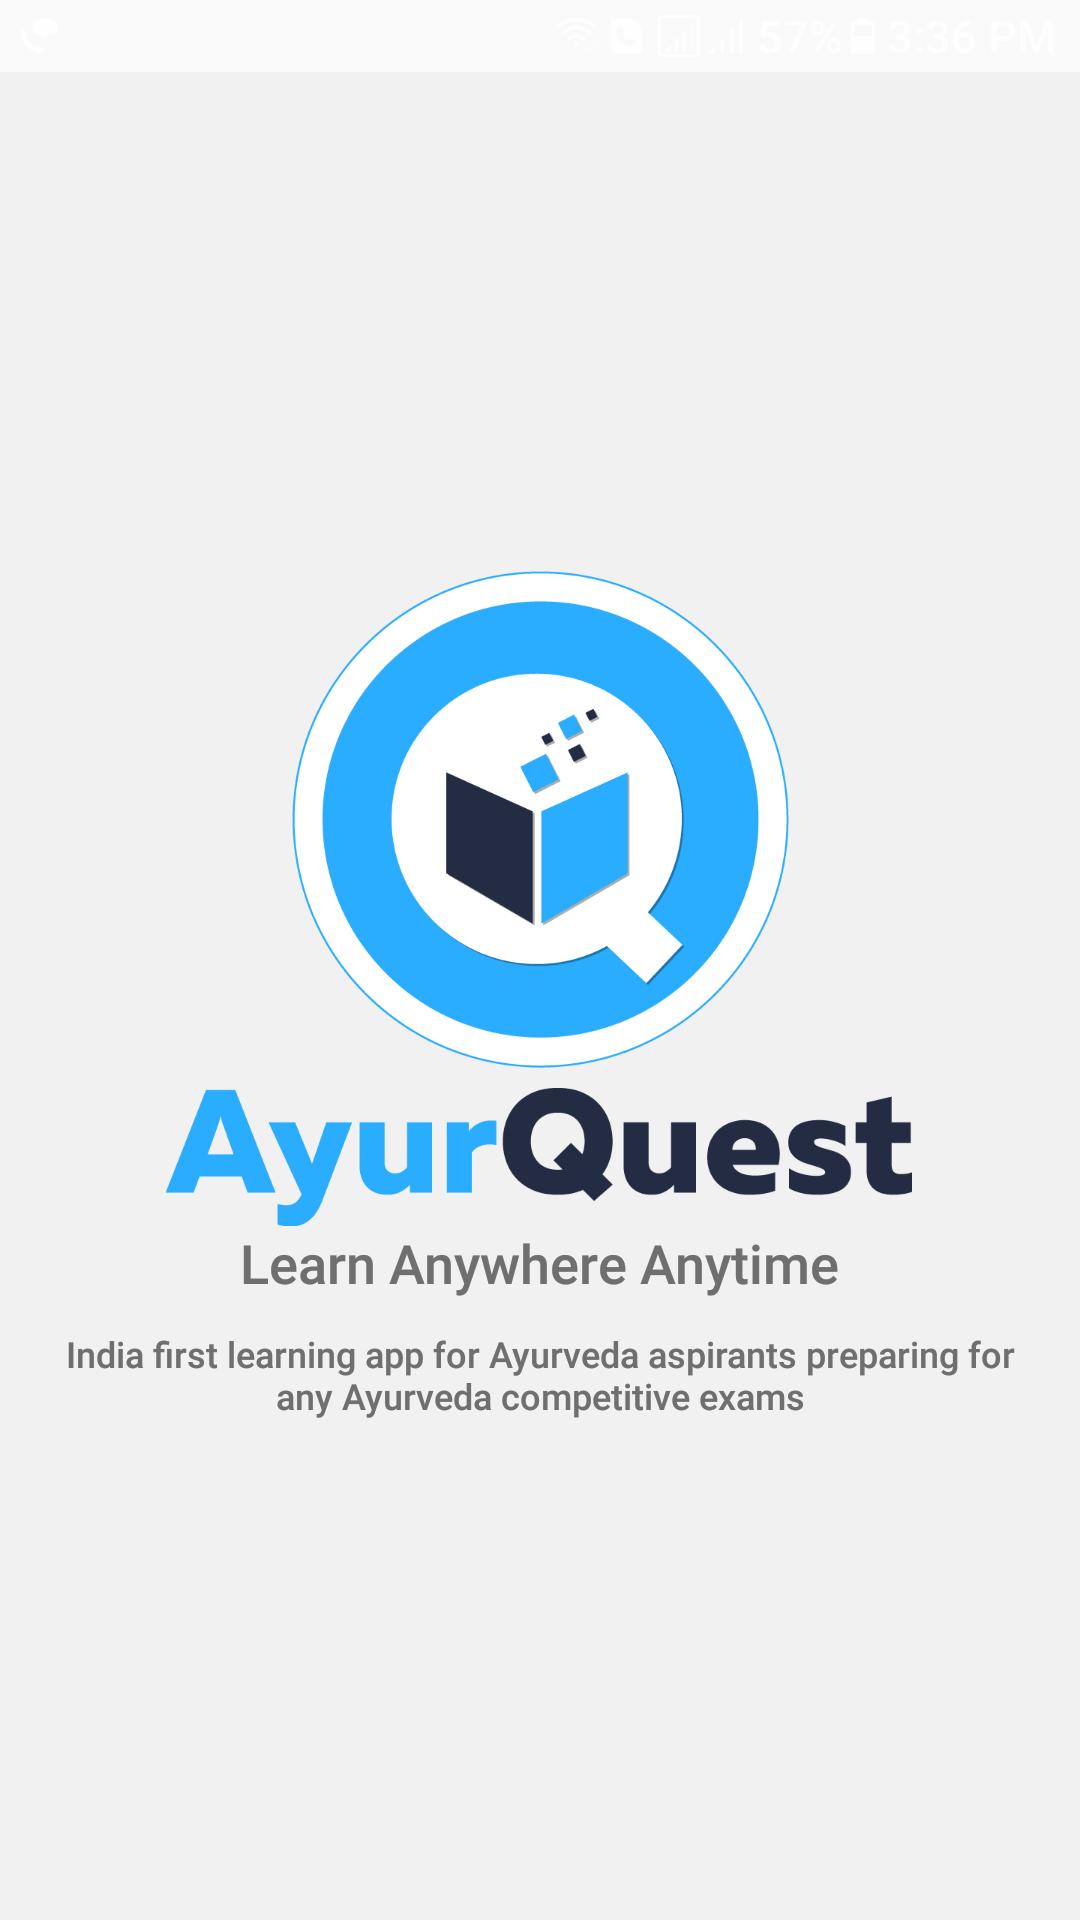 Online Test Series For Ayurveda AIAPGET & UPSC Exams - AyurQuest App